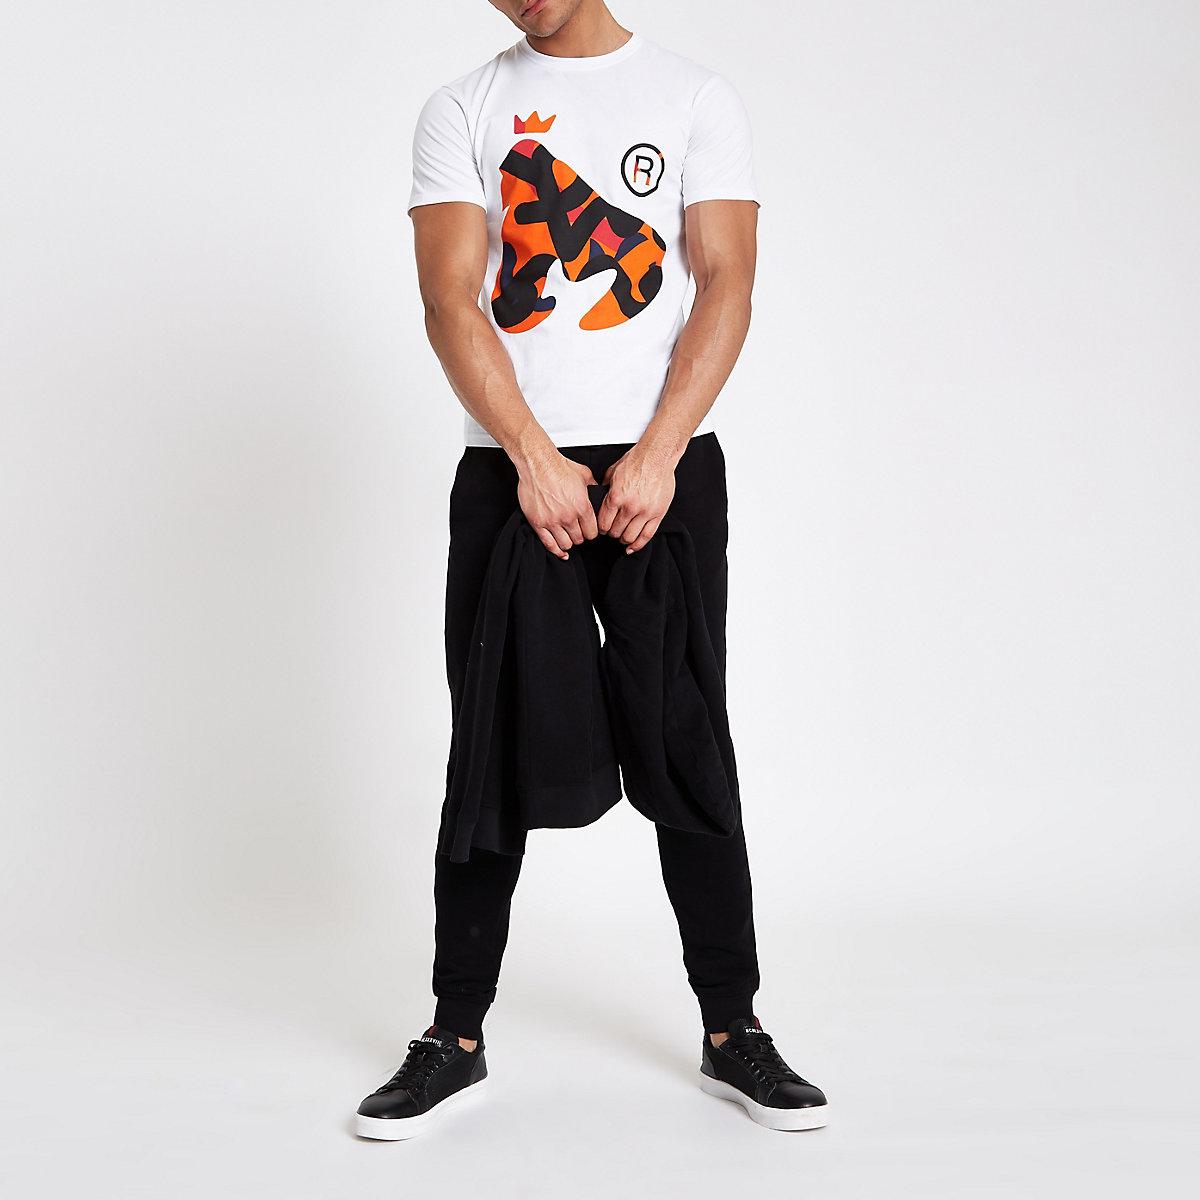 Money Clothing white camo logo T-shirt